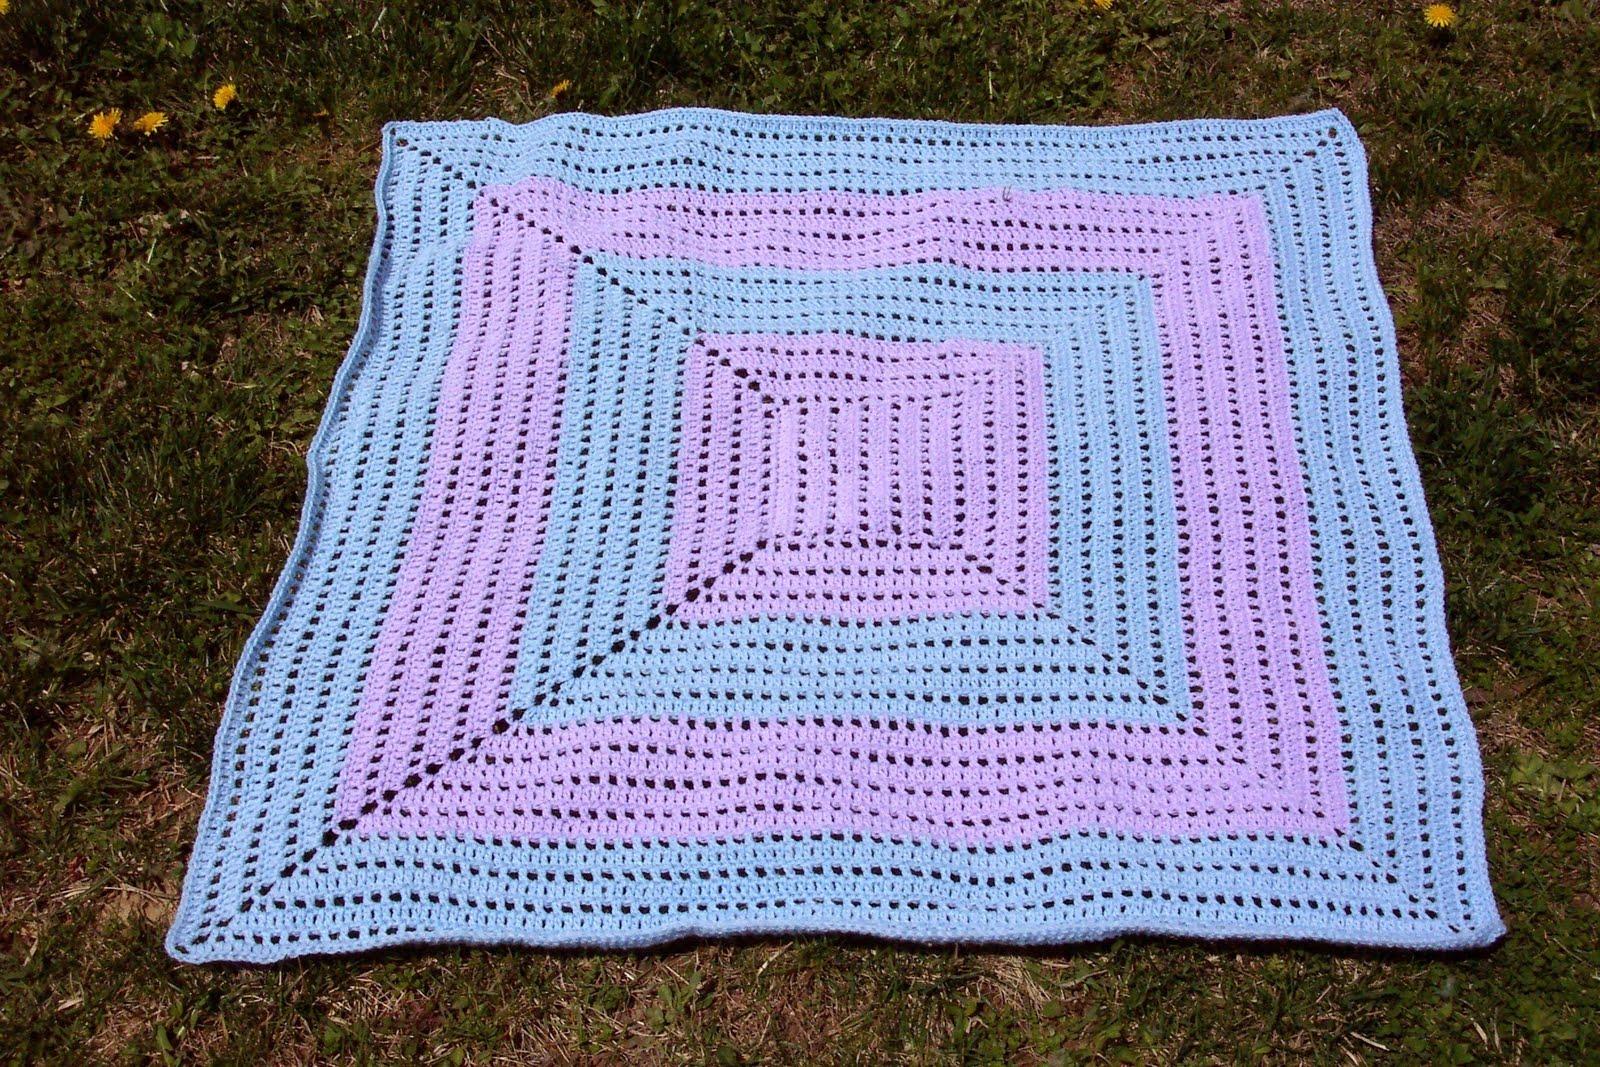 SmoothFox Crochet and Knit: SmothFox's A Whole Lotta Holes ...